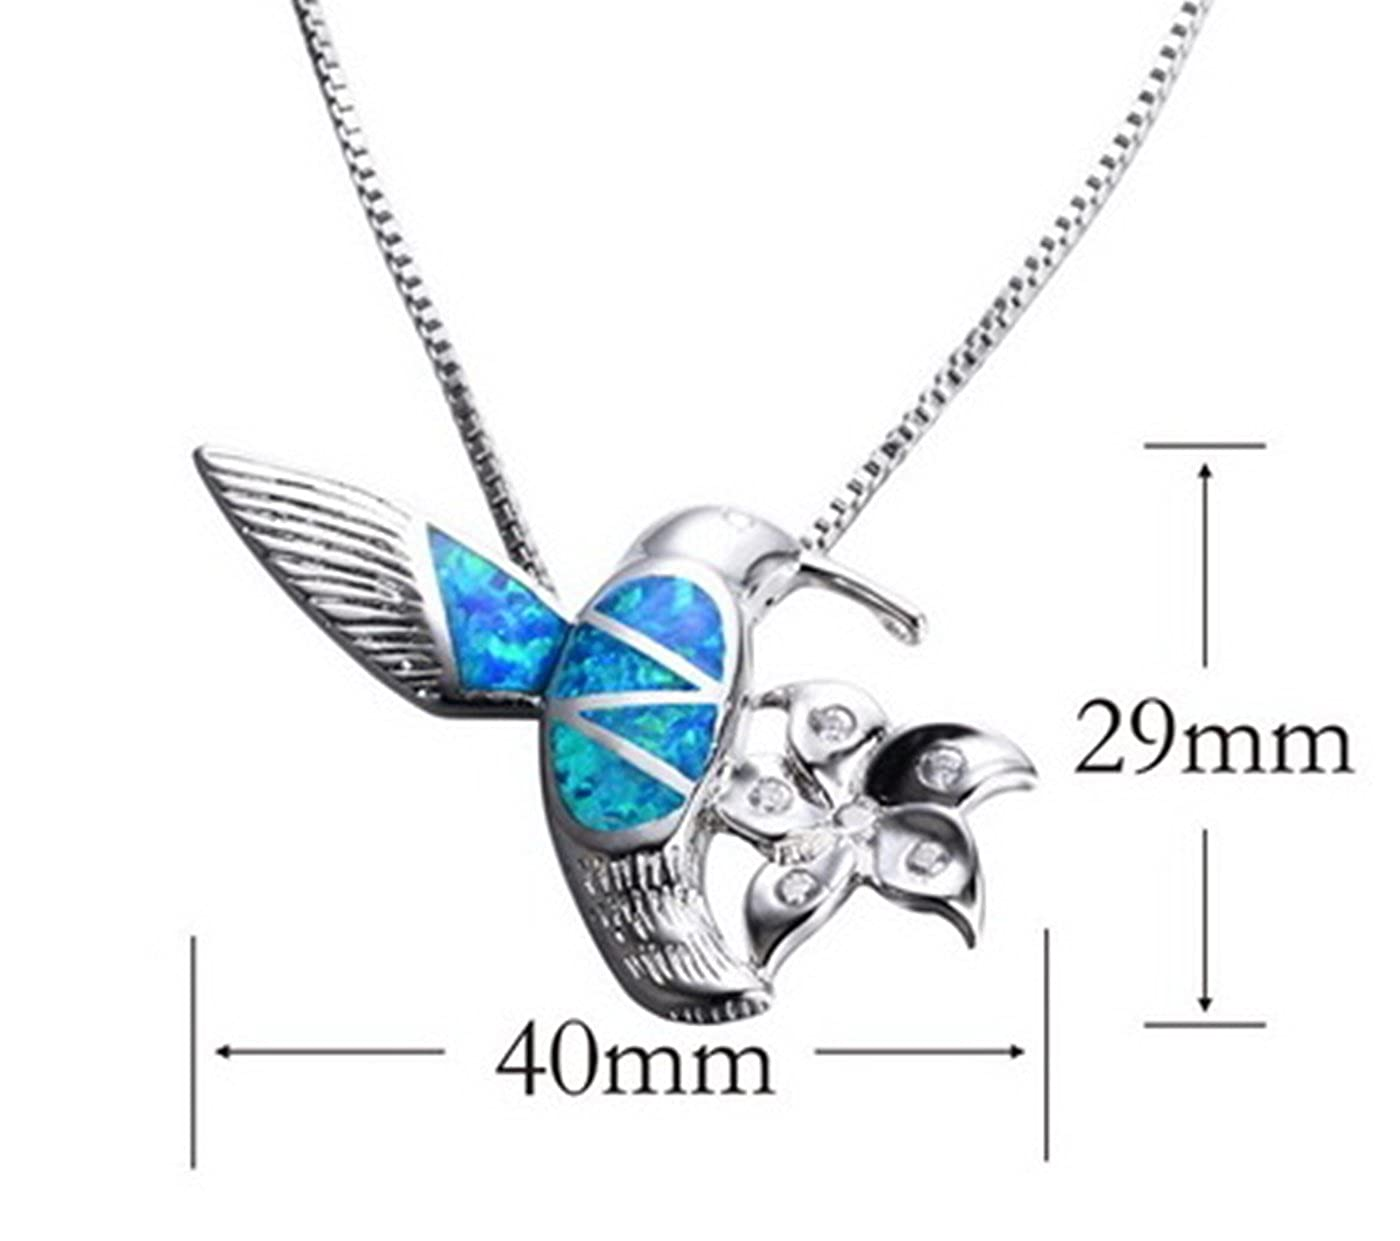 Fortonatori Created Blue Opal Bird Necklace 925 Silver Pendant Necklace 18 Chain